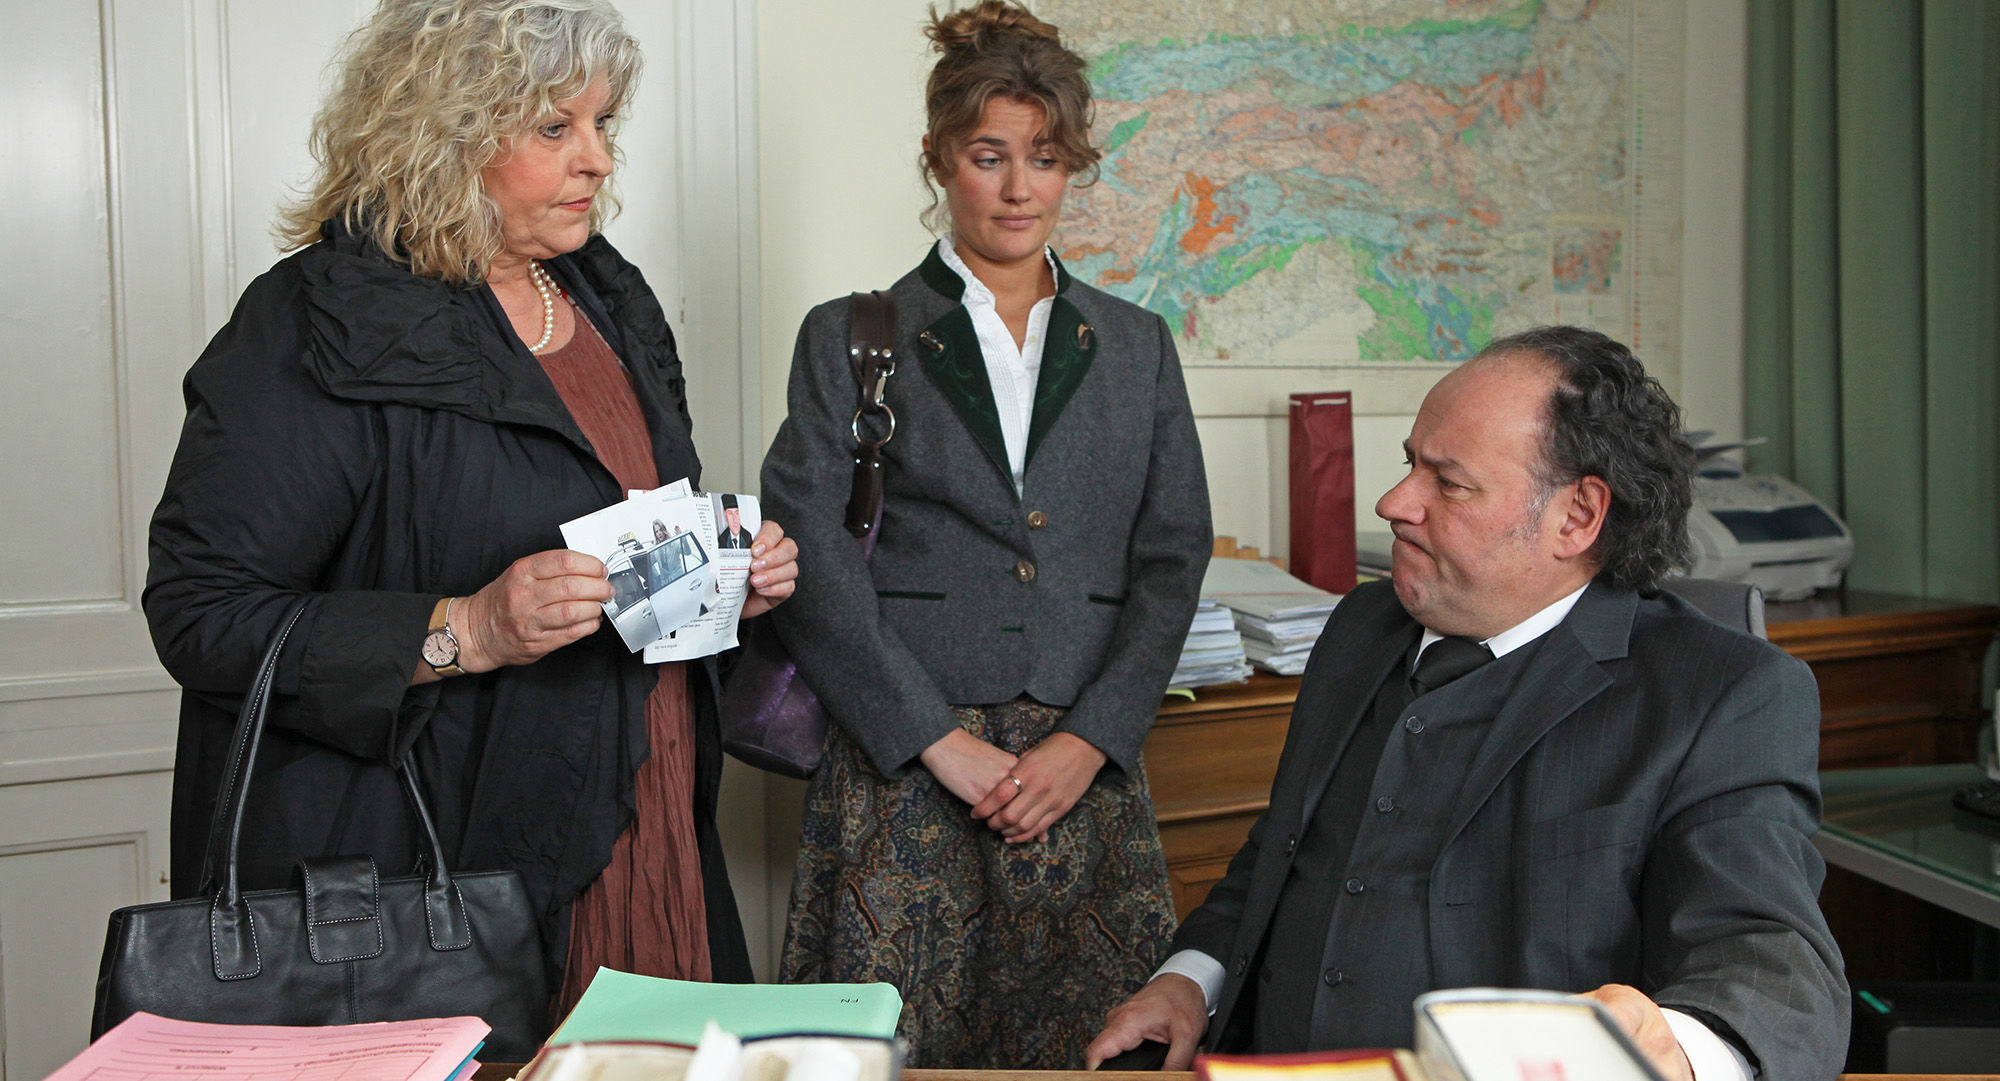 Elfi Eschke (Sarah Horrowitz), Cora Jeannee (Miriam), Christian Weinberger (Dr. Kainroth)